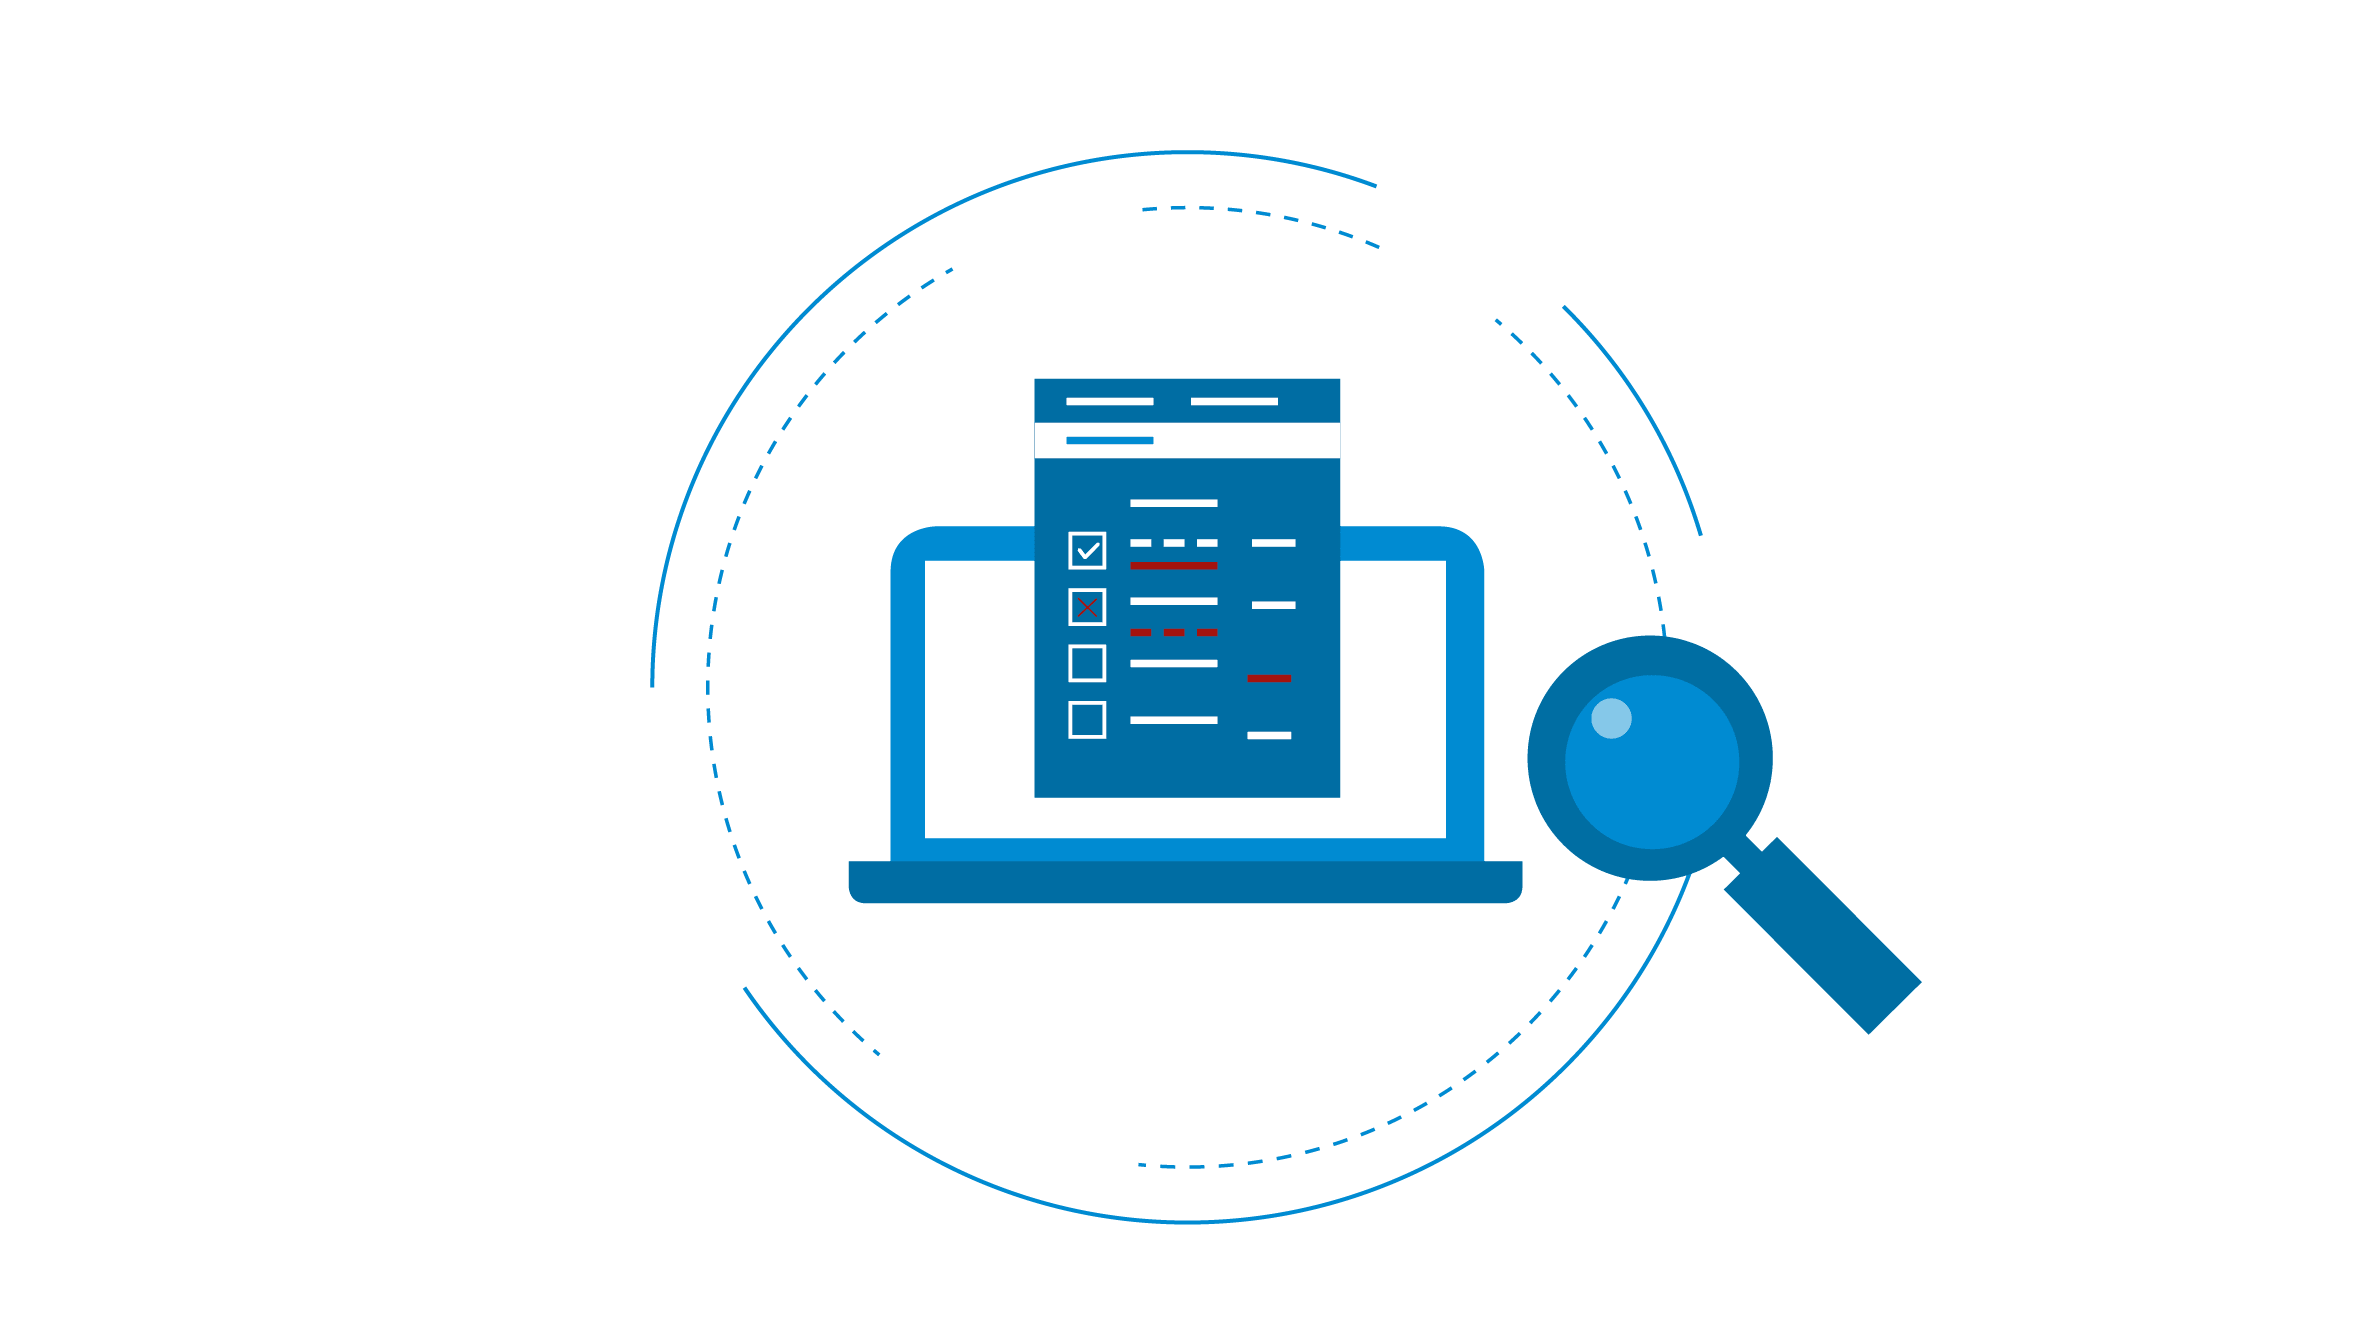 Kostenrechnung_Section_3.png